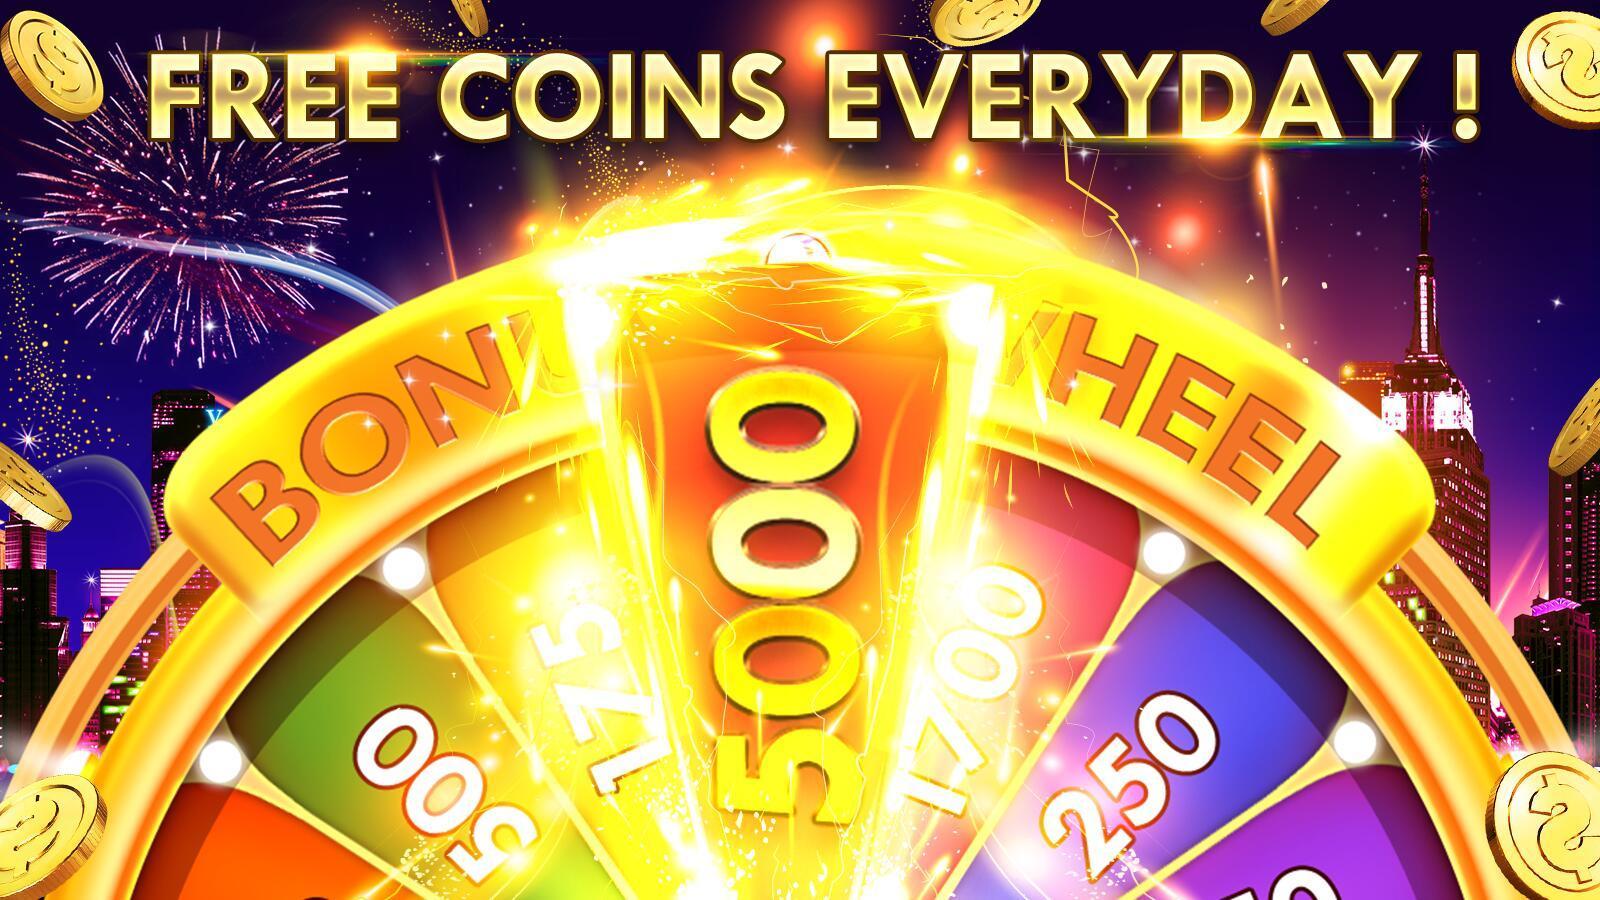 Jogos slots casino gratis 5 tambores